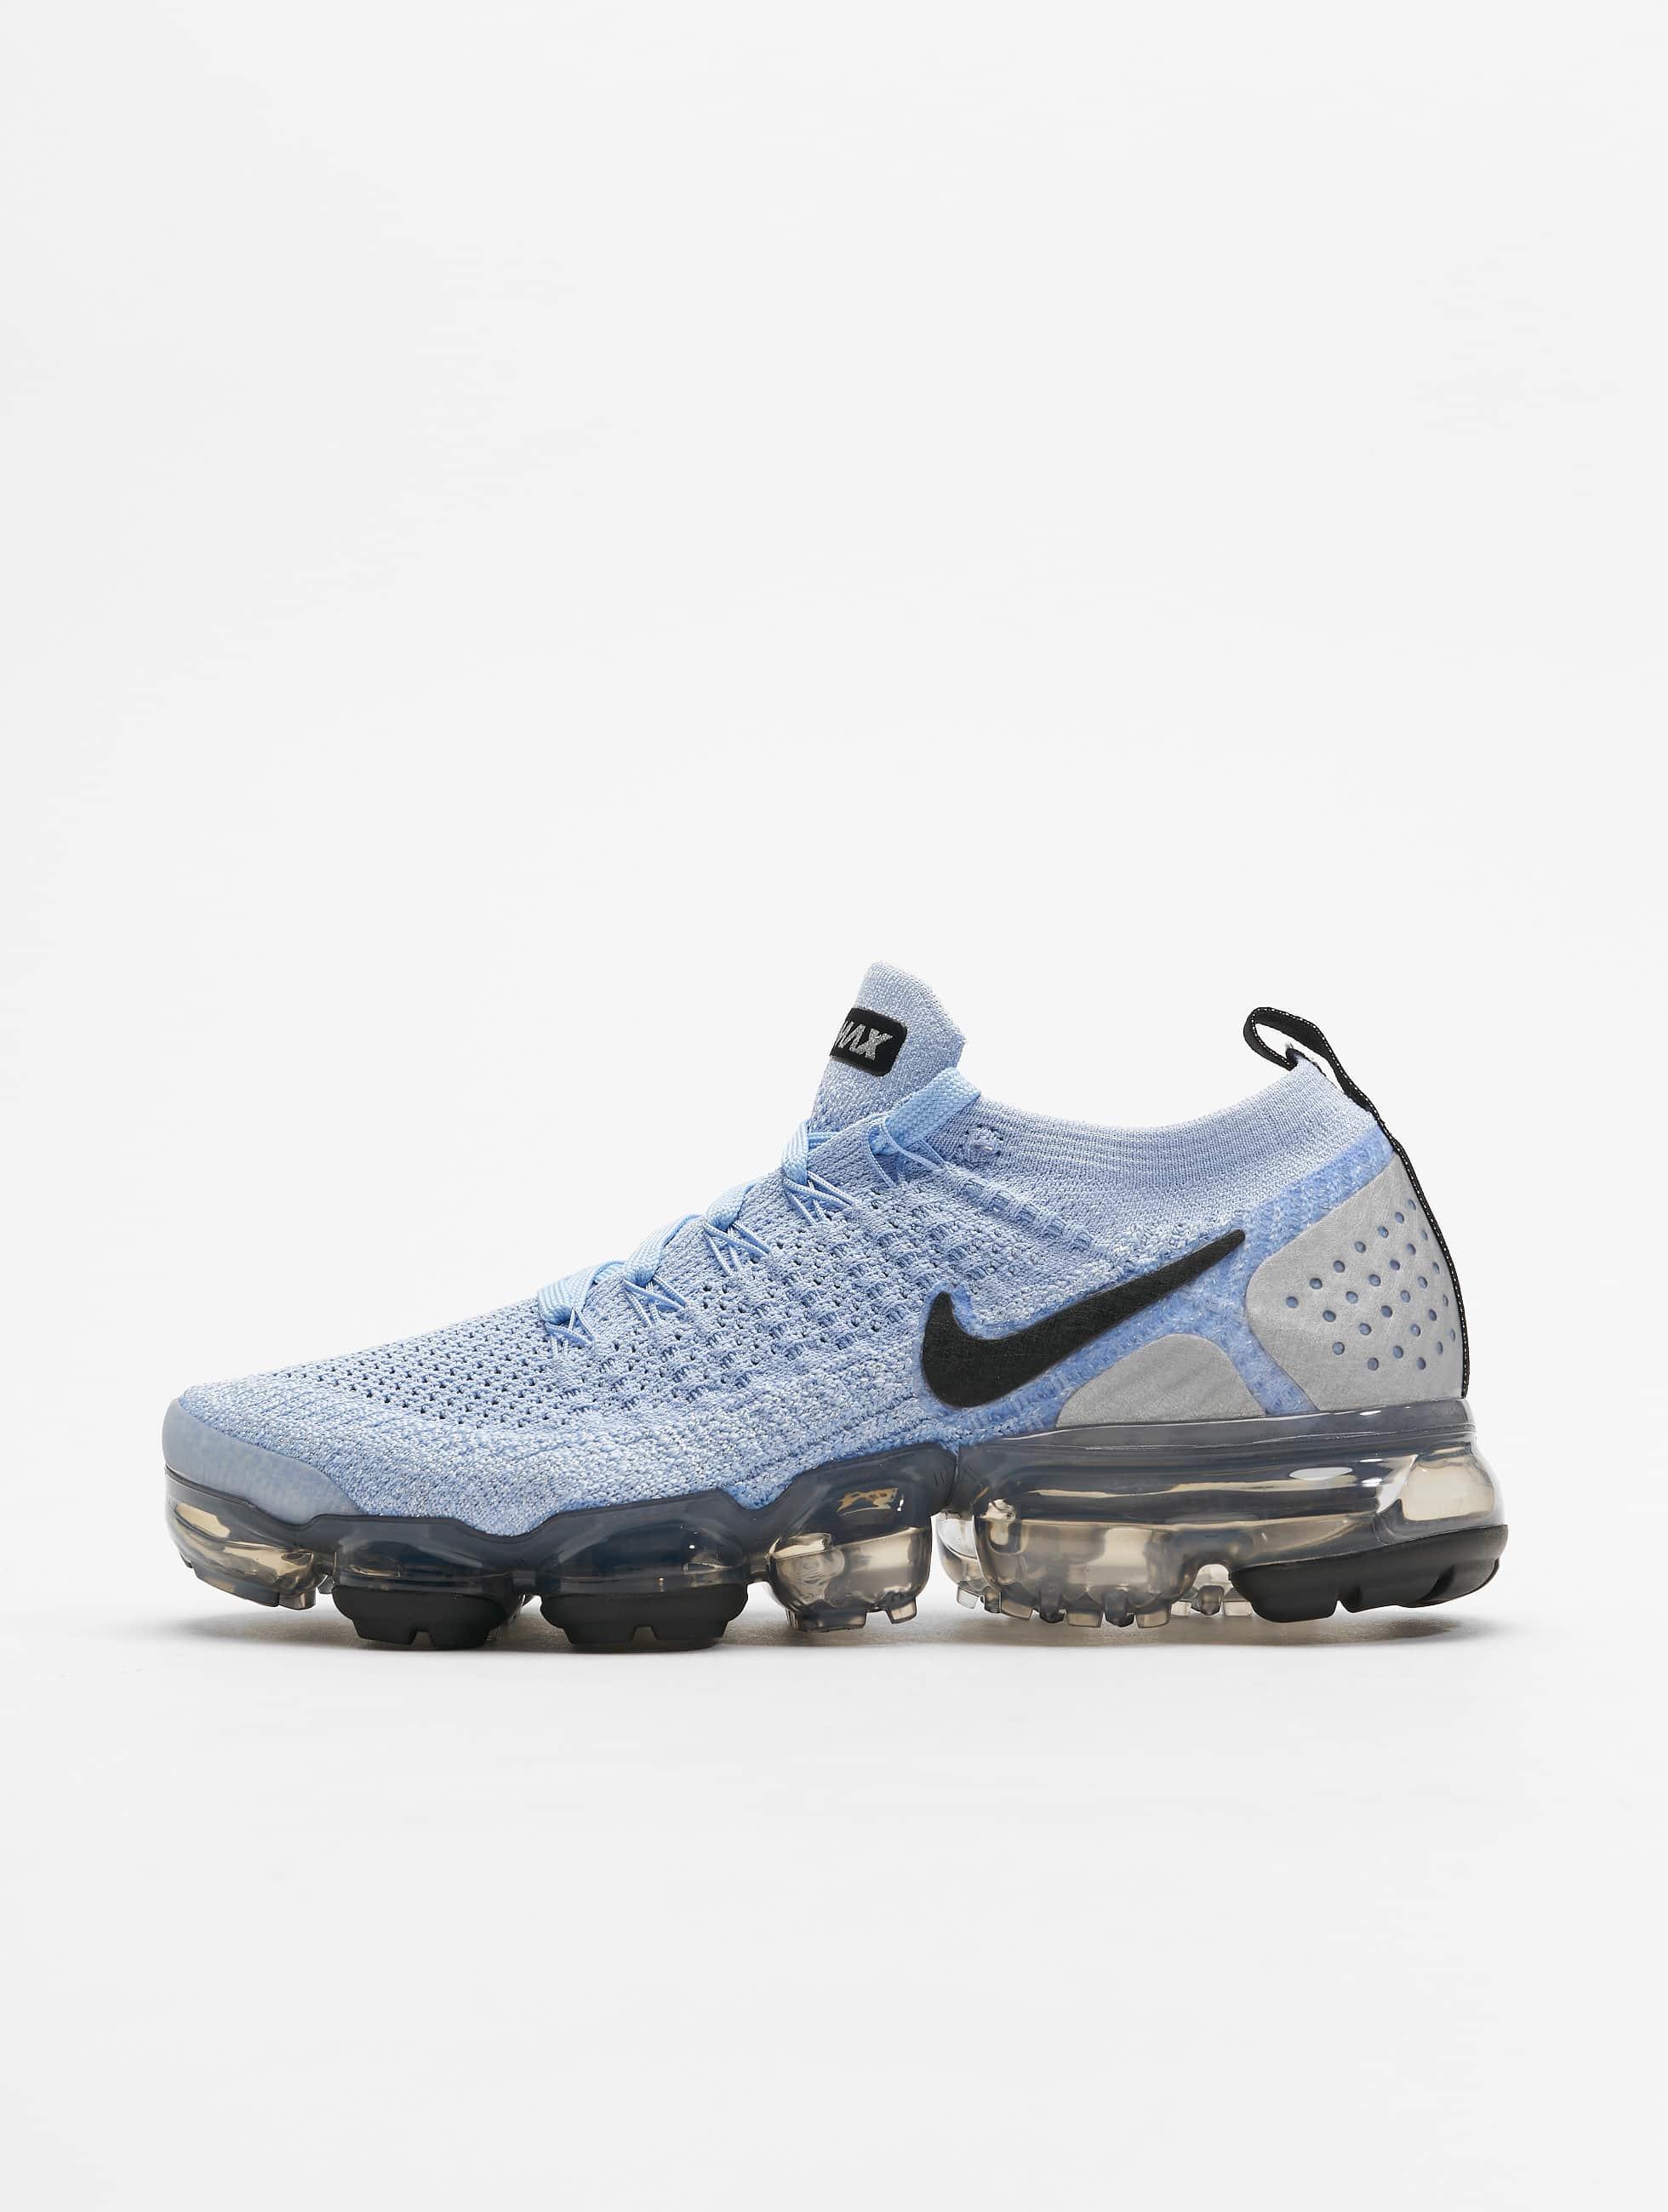 Nike Air Vapormax Flyknit 2 Sneakers AluminumBlackMetallic_Silvern